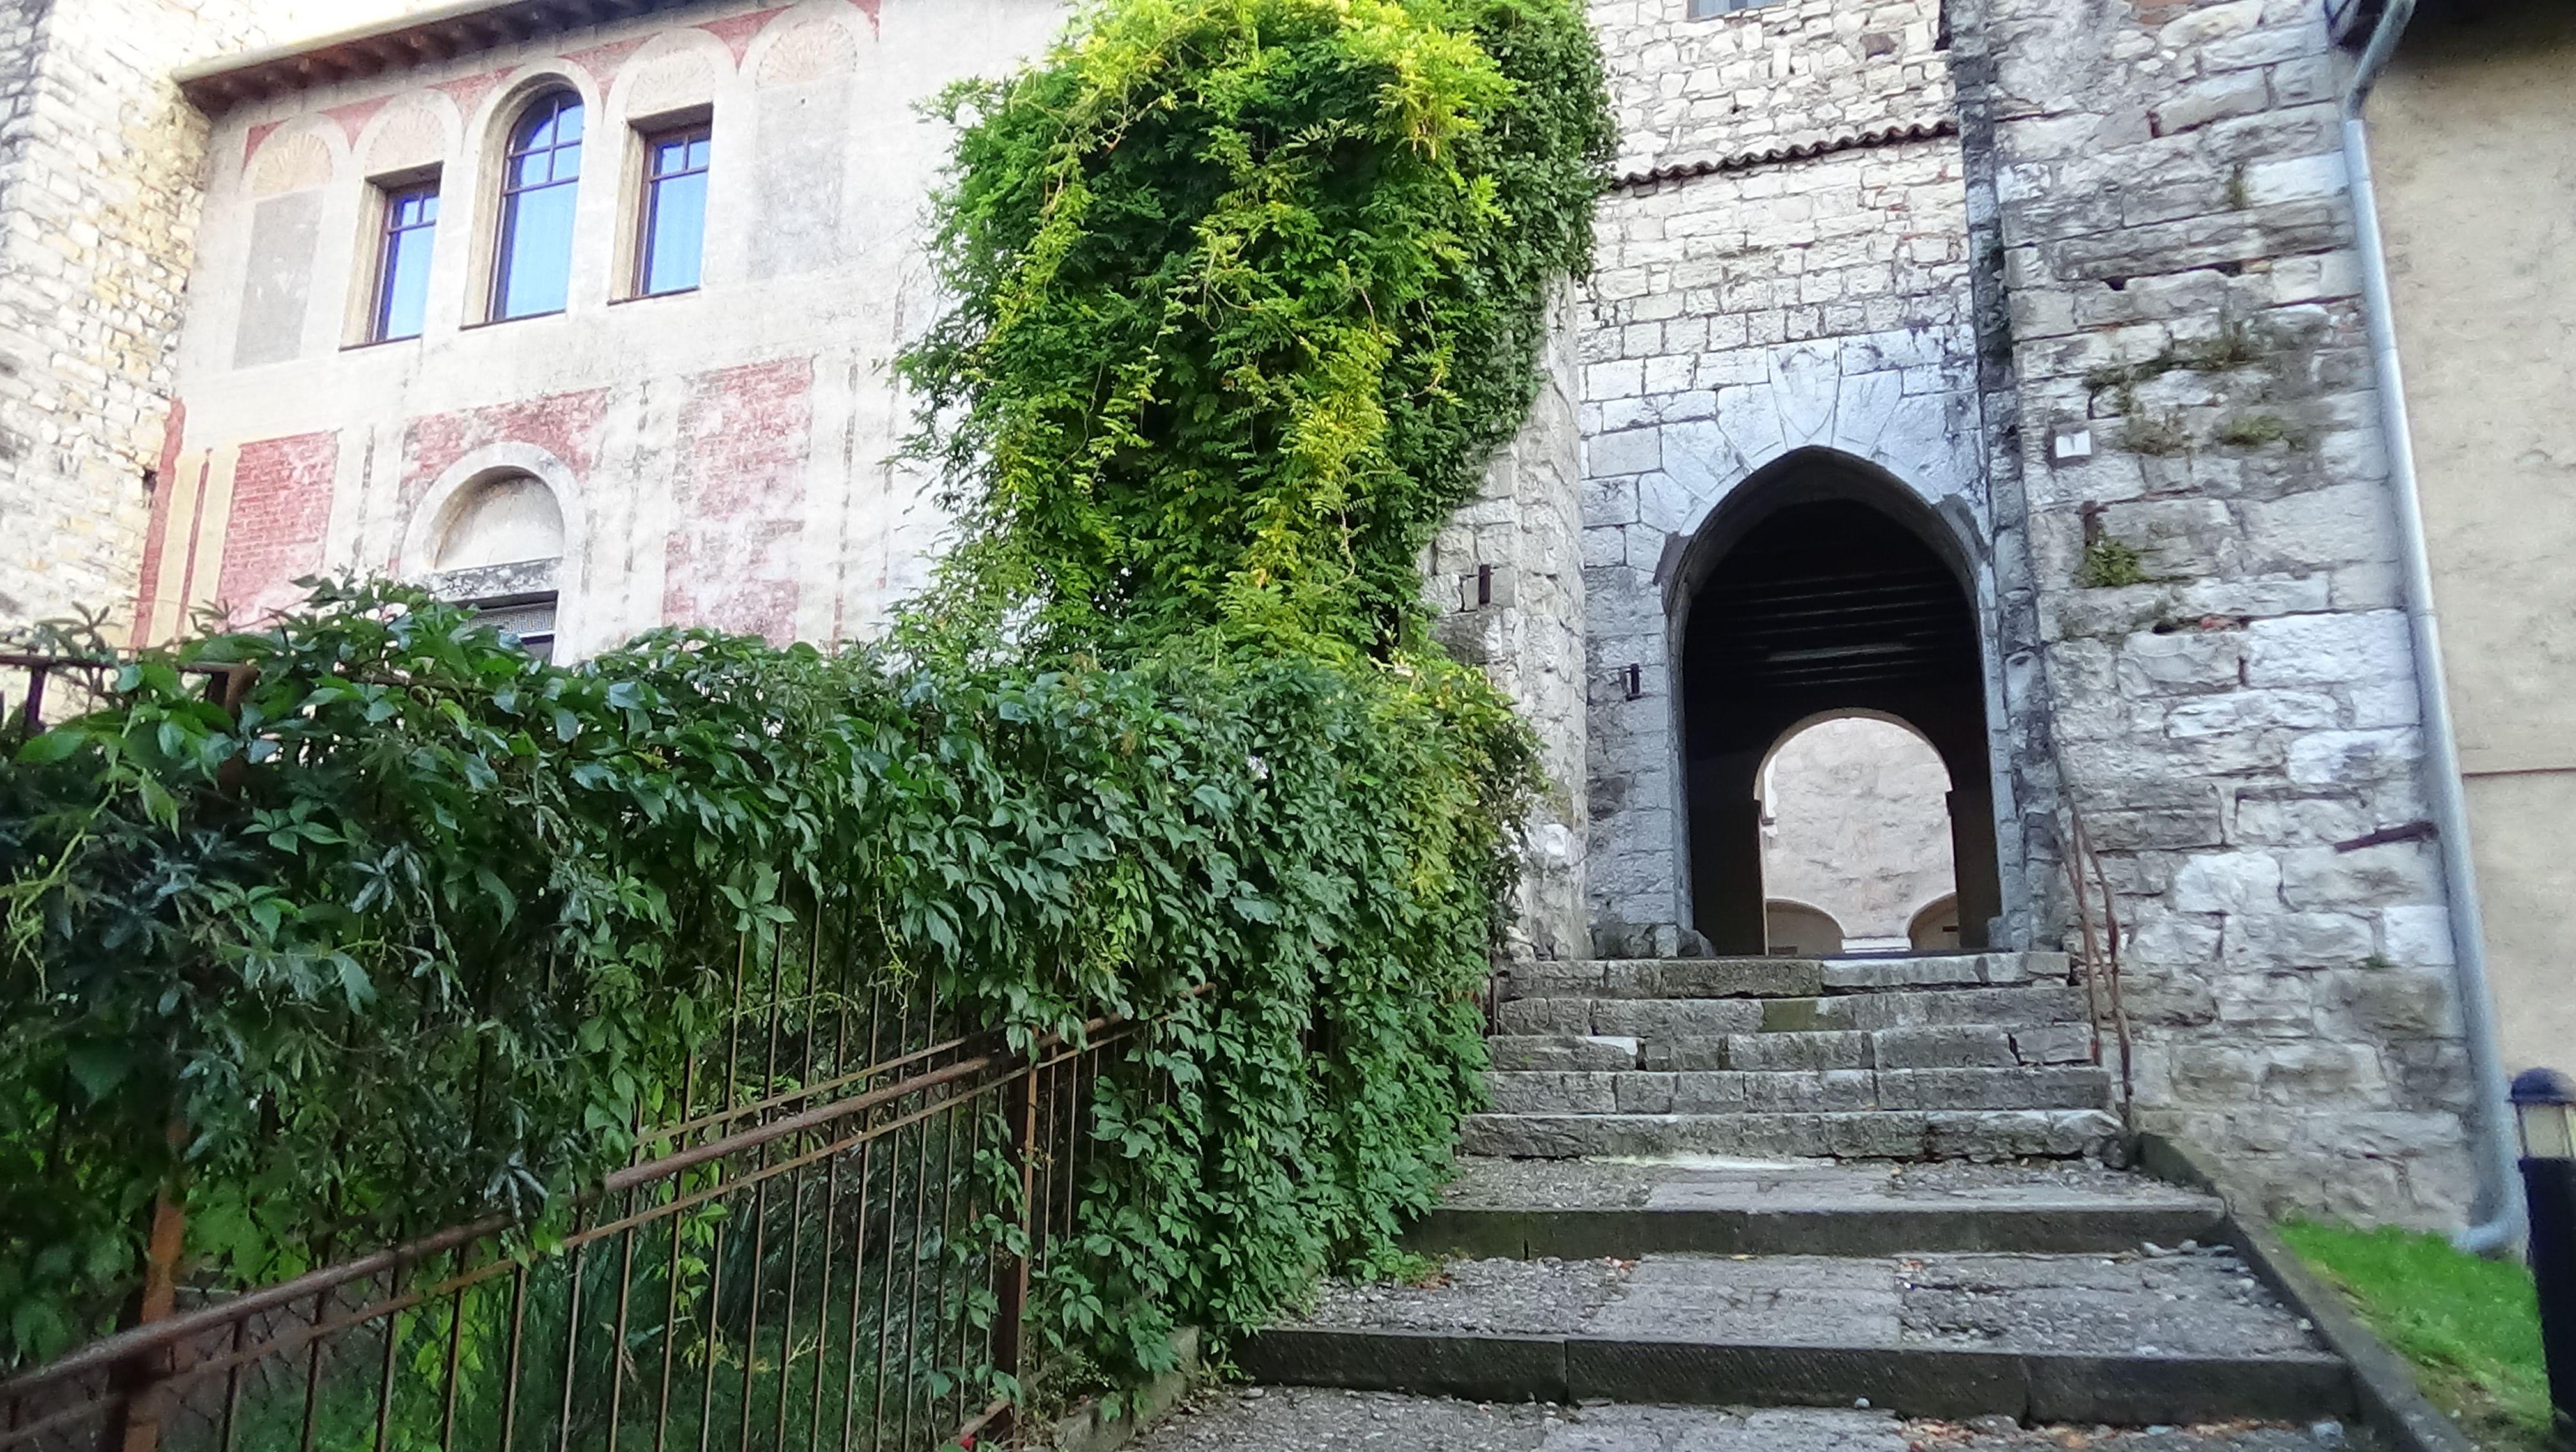 Medieval castle of the Oldofredi Family